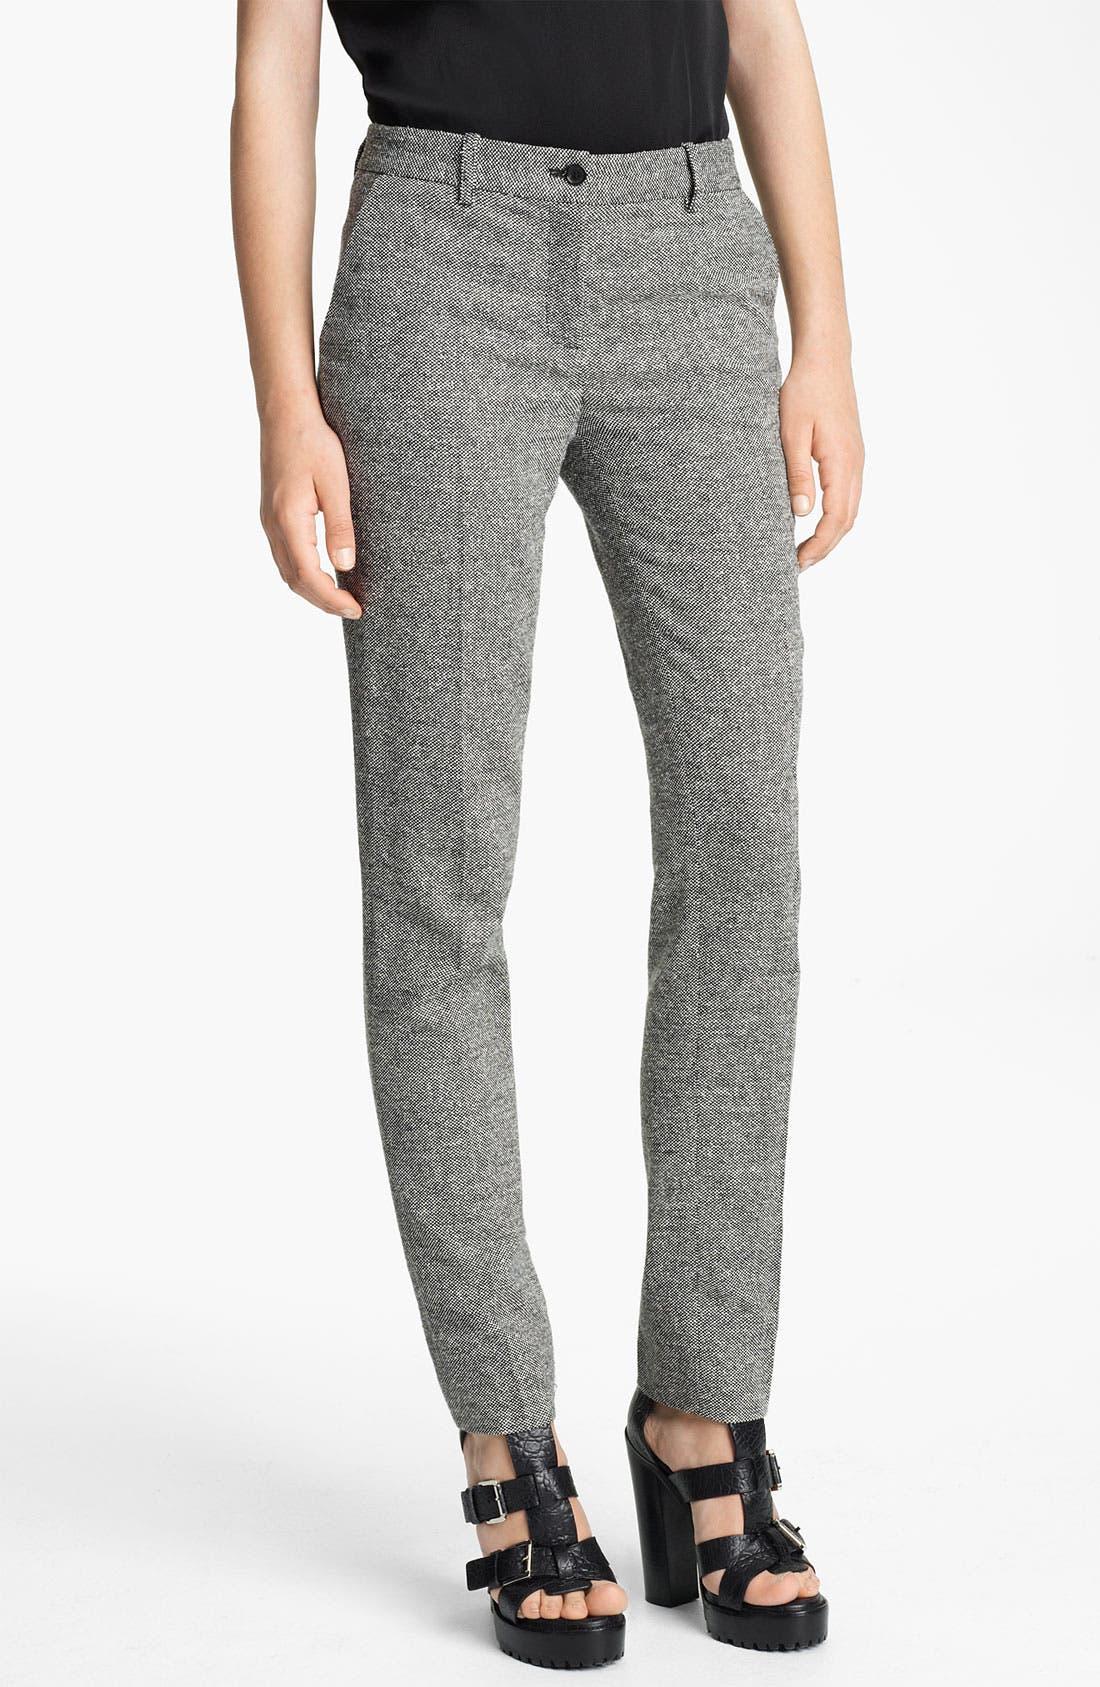 Alternate Image 1 Selected - Michael Kors 'Samantha' Skinny Donegal Tweed Pants